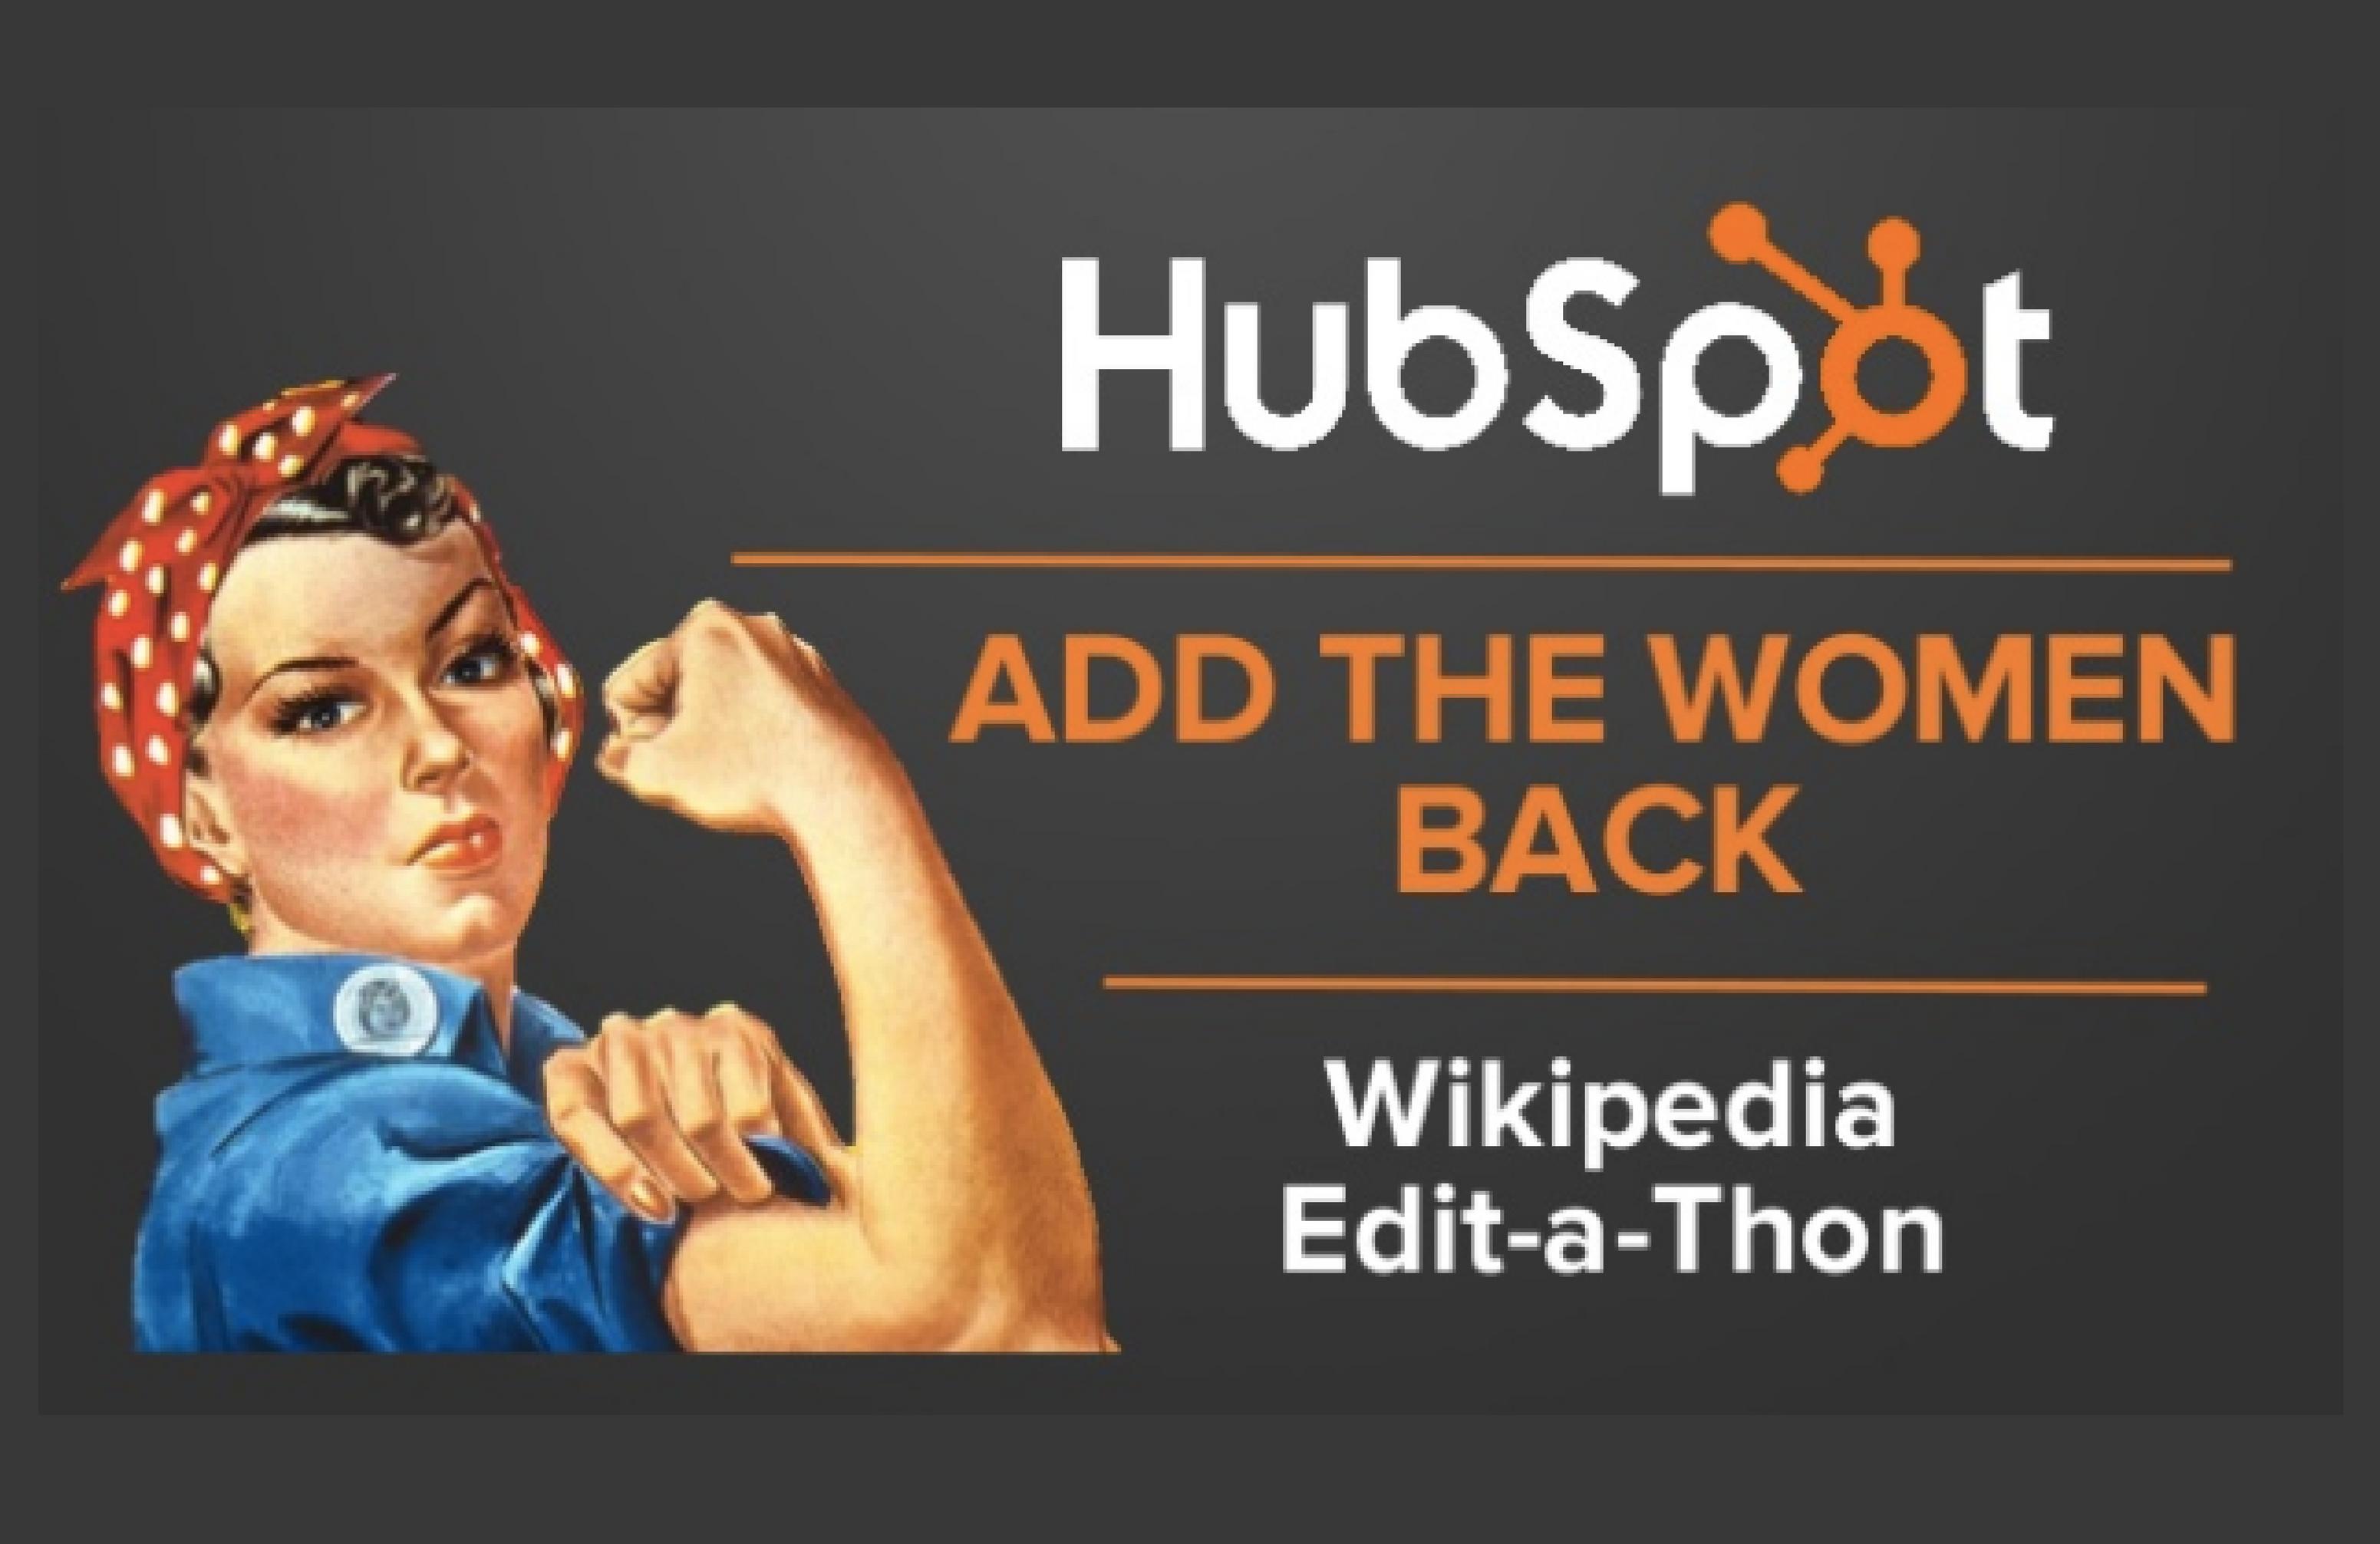 wikipedia_edit_a_thon